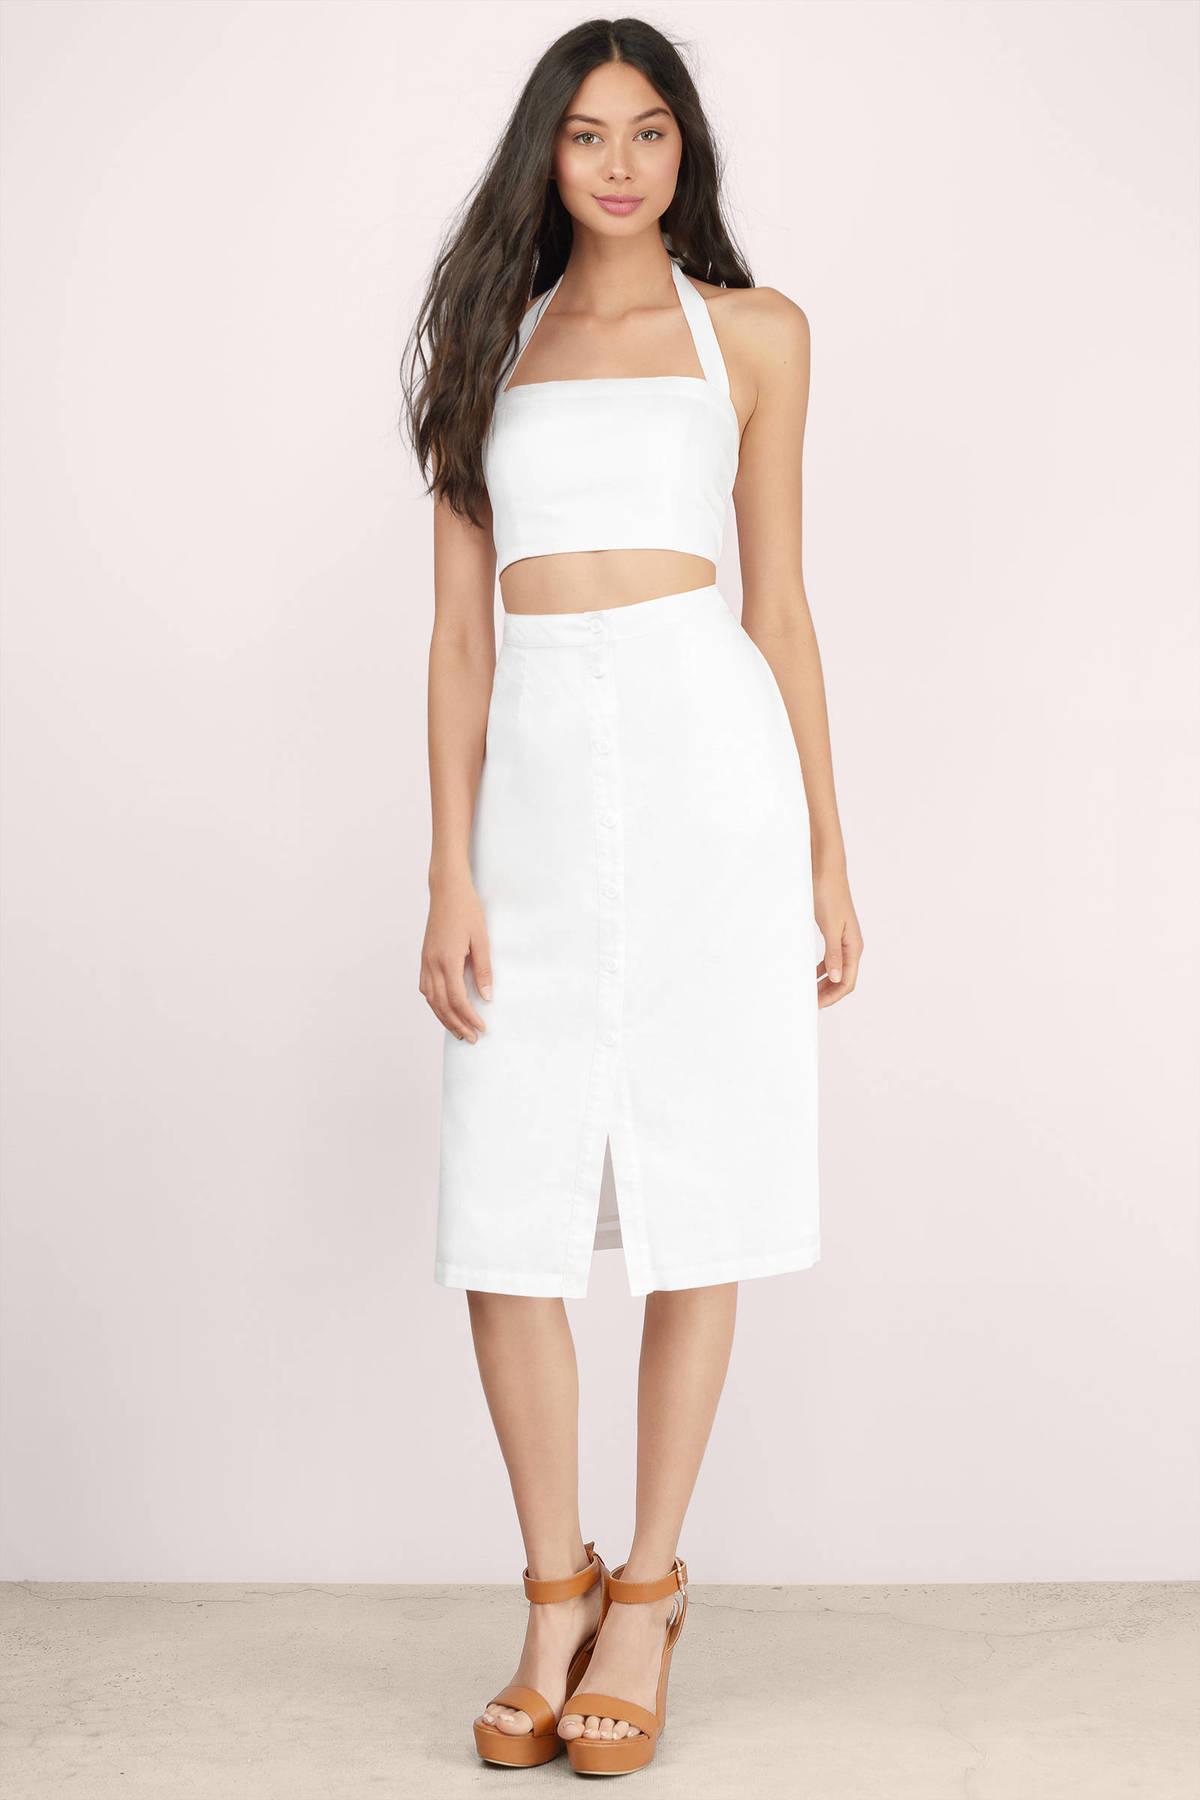 where to buy midi skirts redskirtz